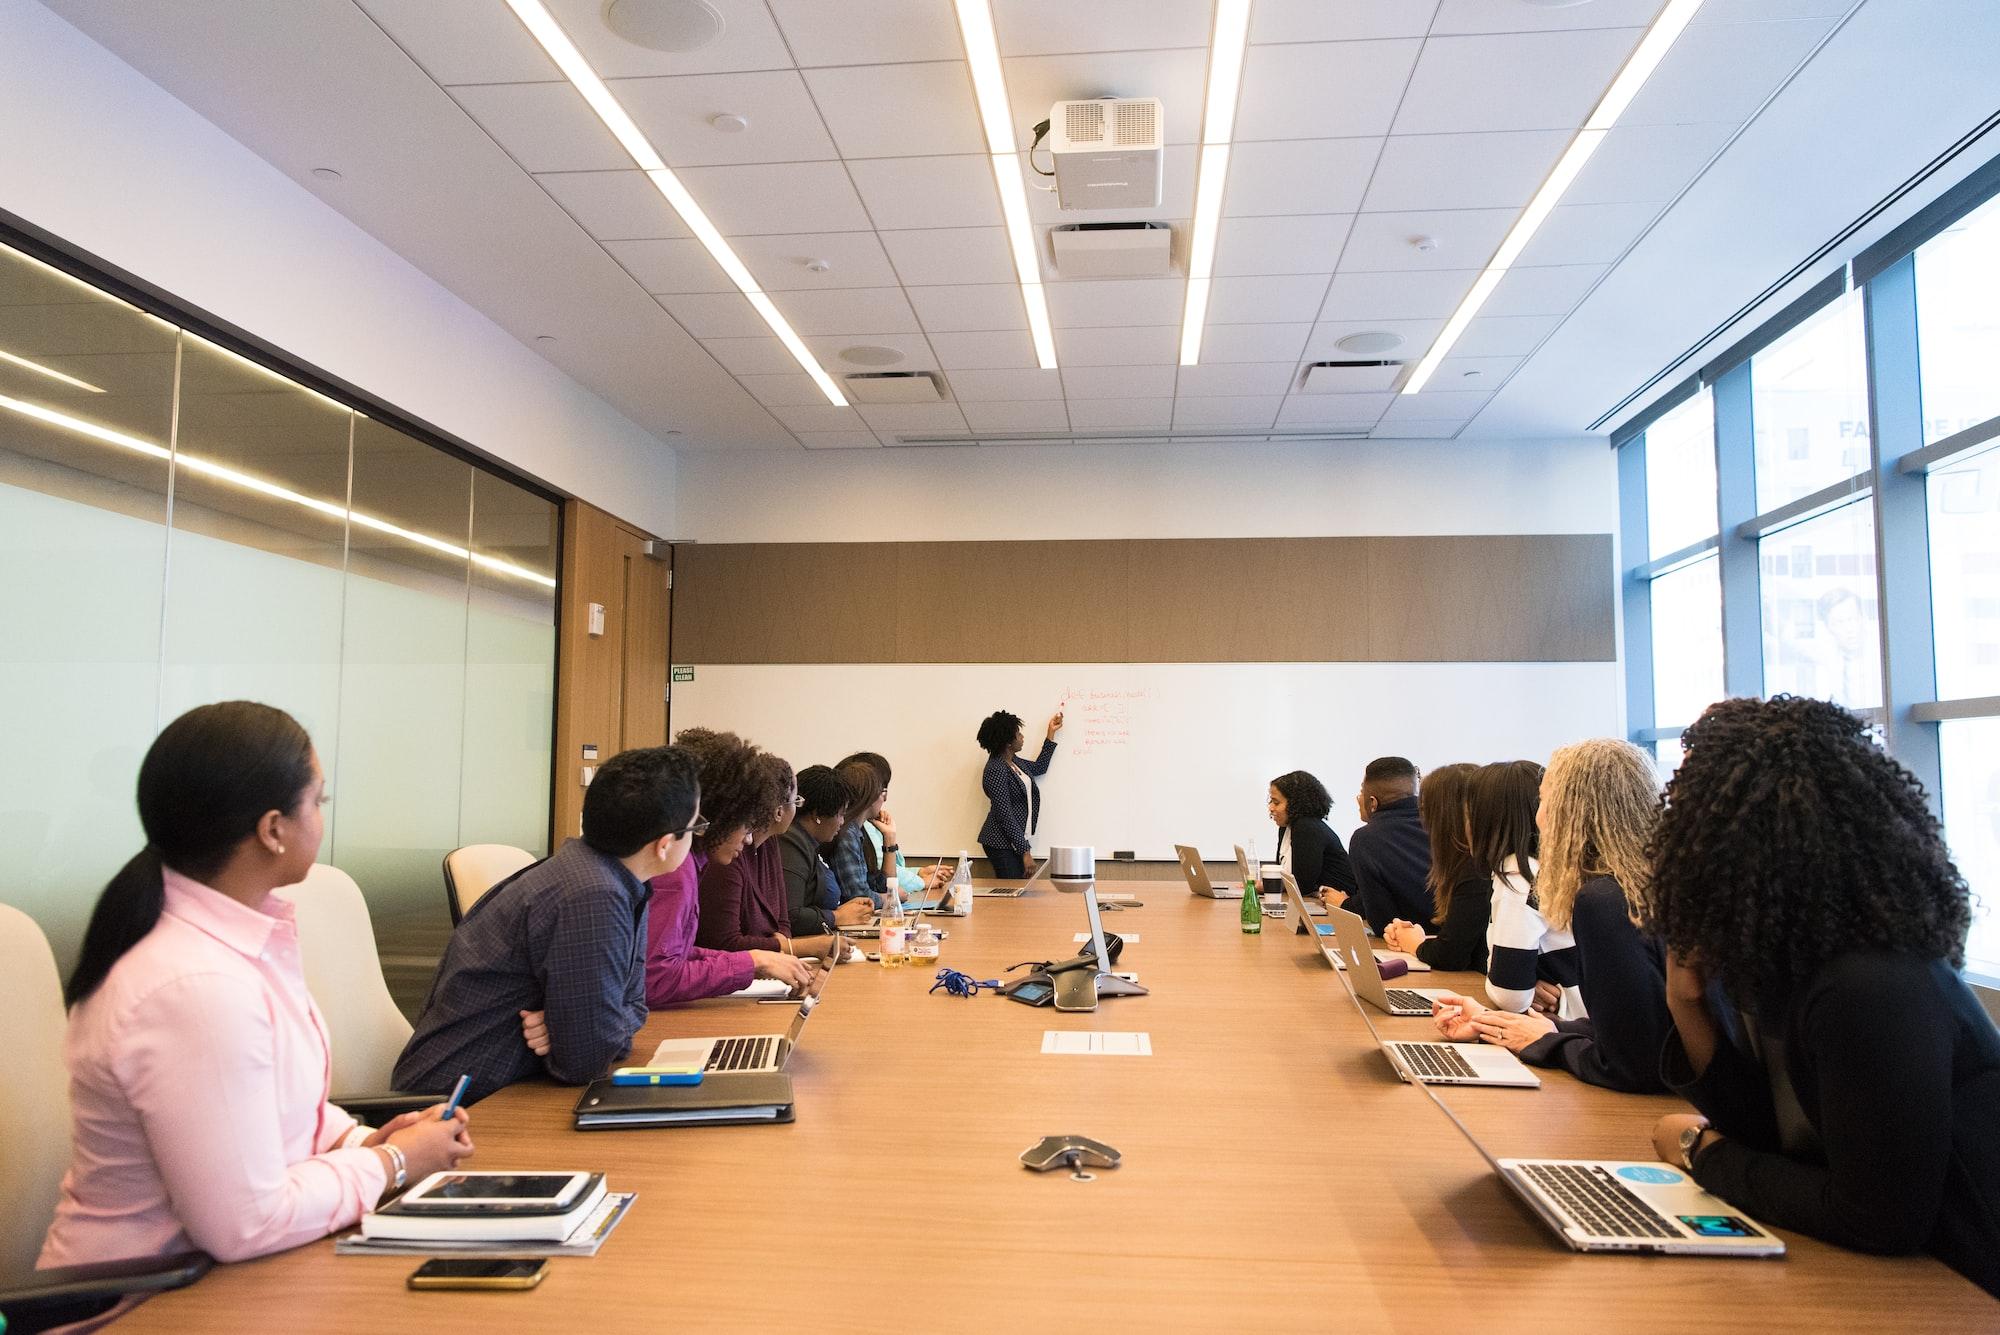 International Women's Day 2021 Special: Business Ideas for Women Entrepreneurs